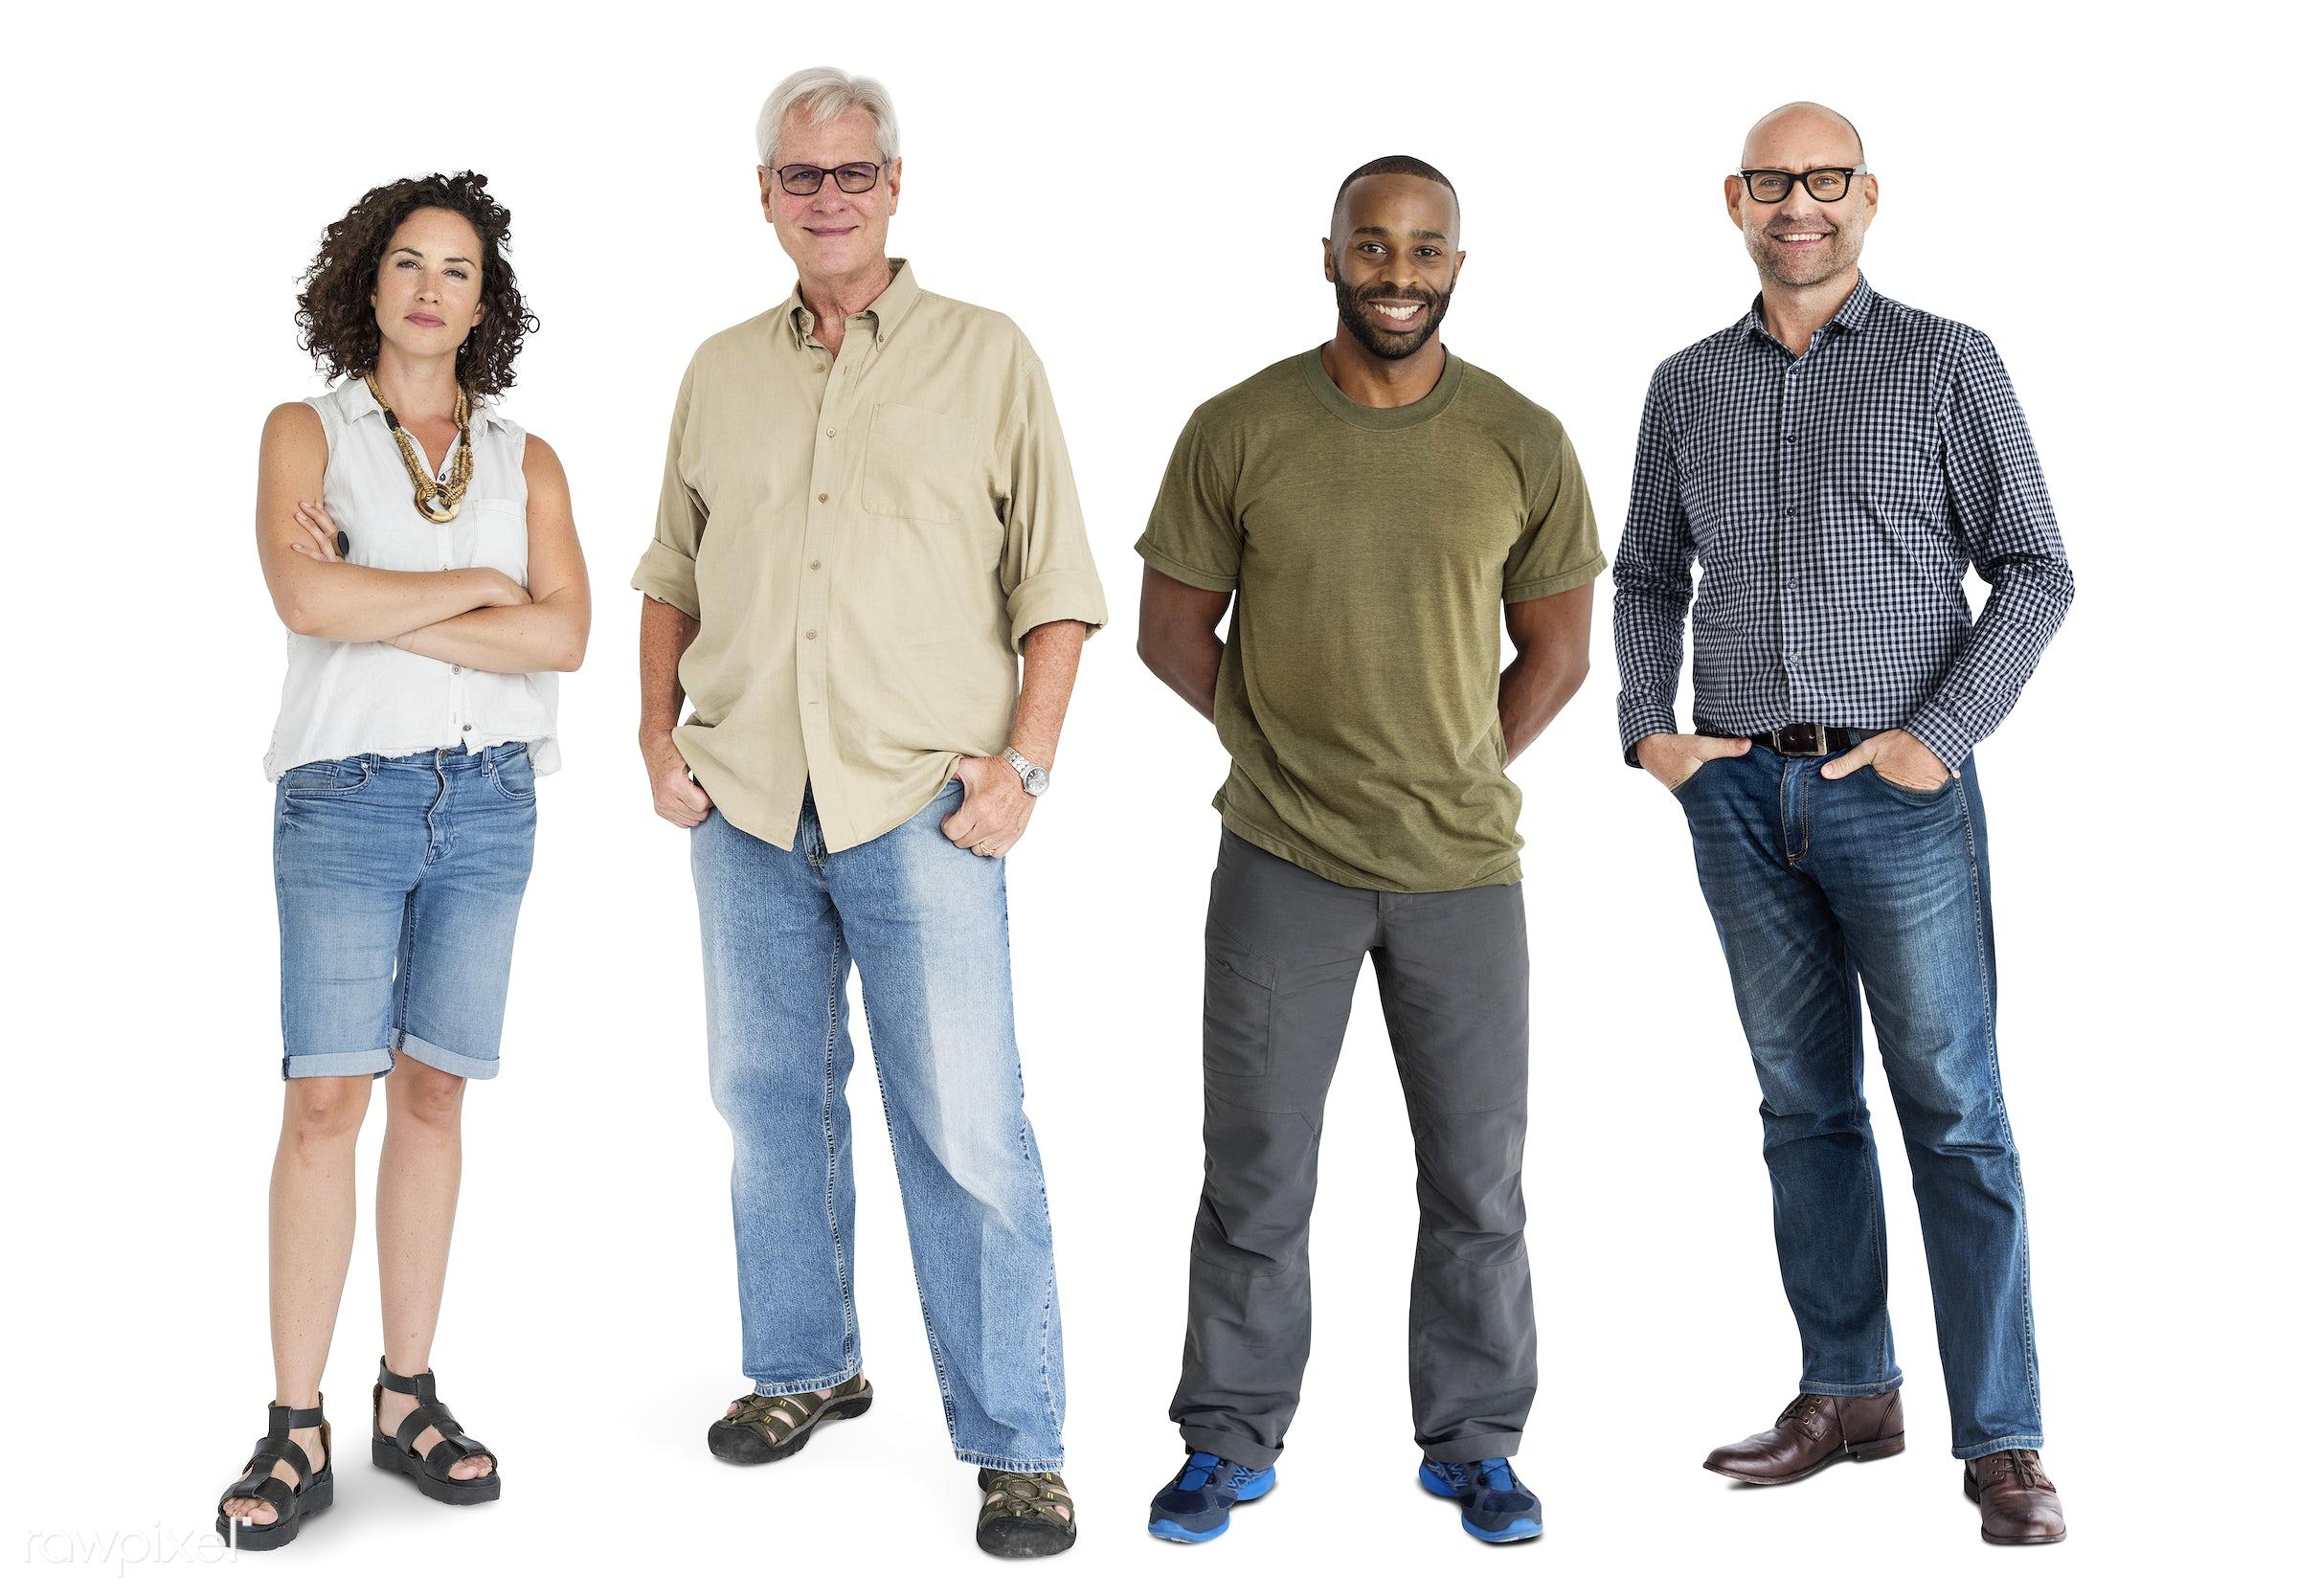 gentlemen, studio, person, diverse, set, retired, retire, people, attraction, together, caucasian, asian, retirement, life,...